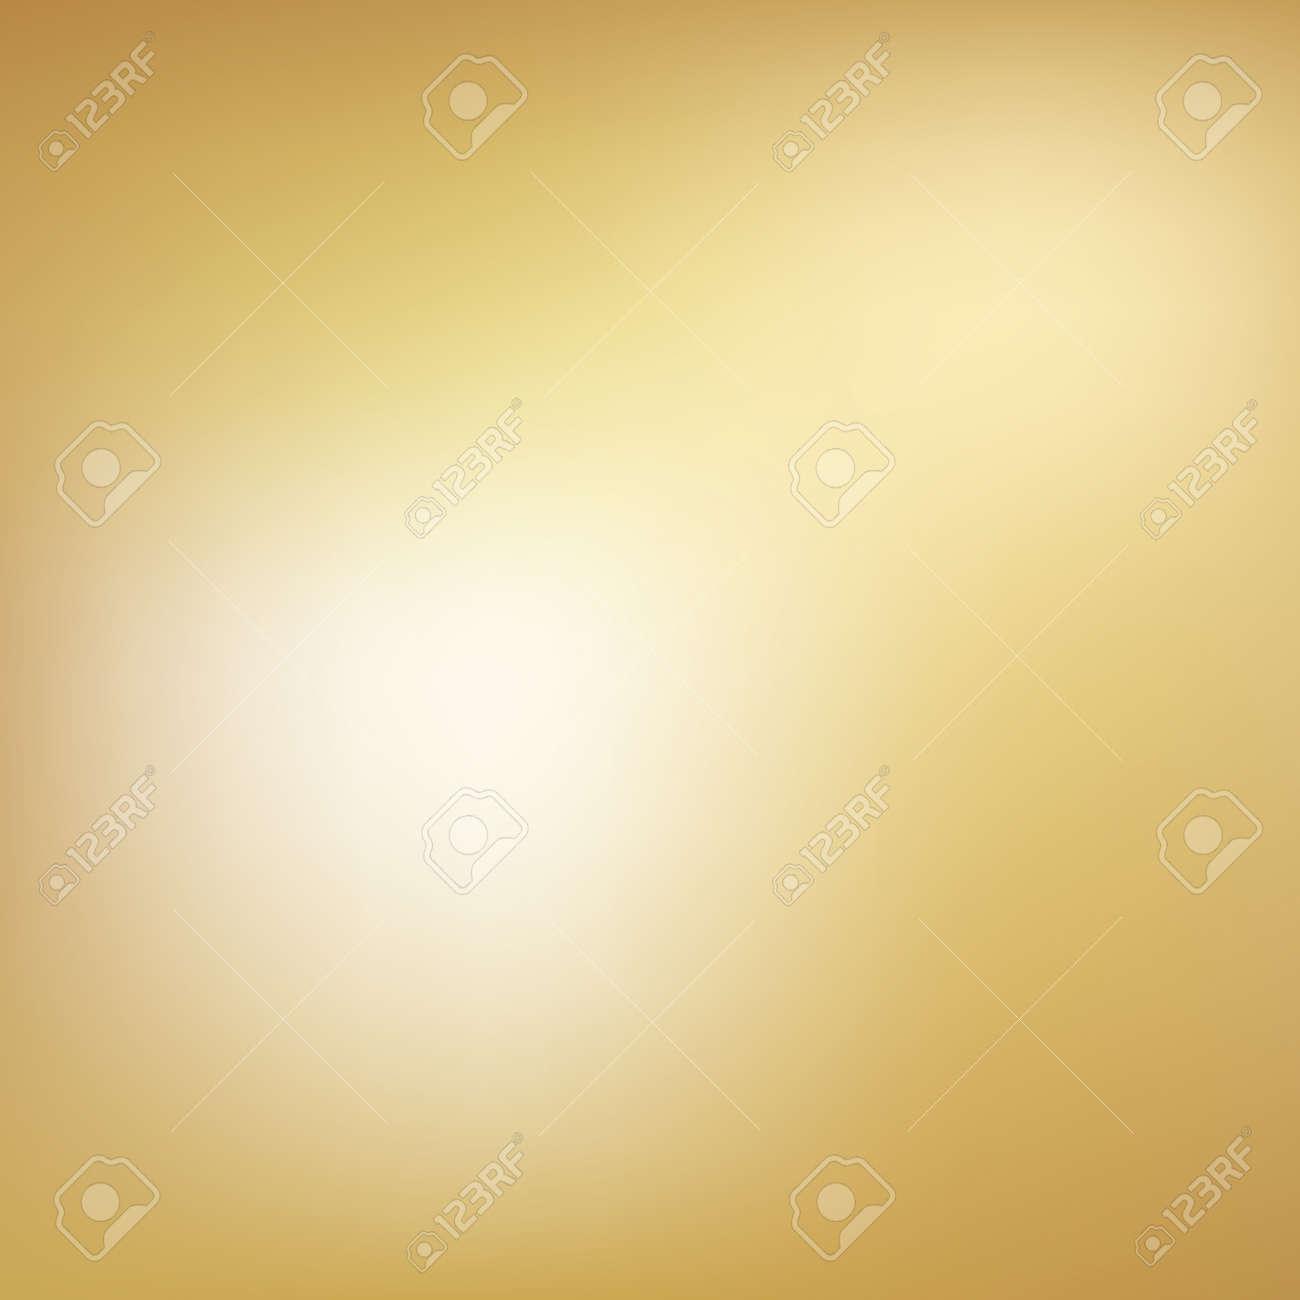 Gold background gradient foil vector yellow texture. Smooth gold gradient blur metallic - 168932633